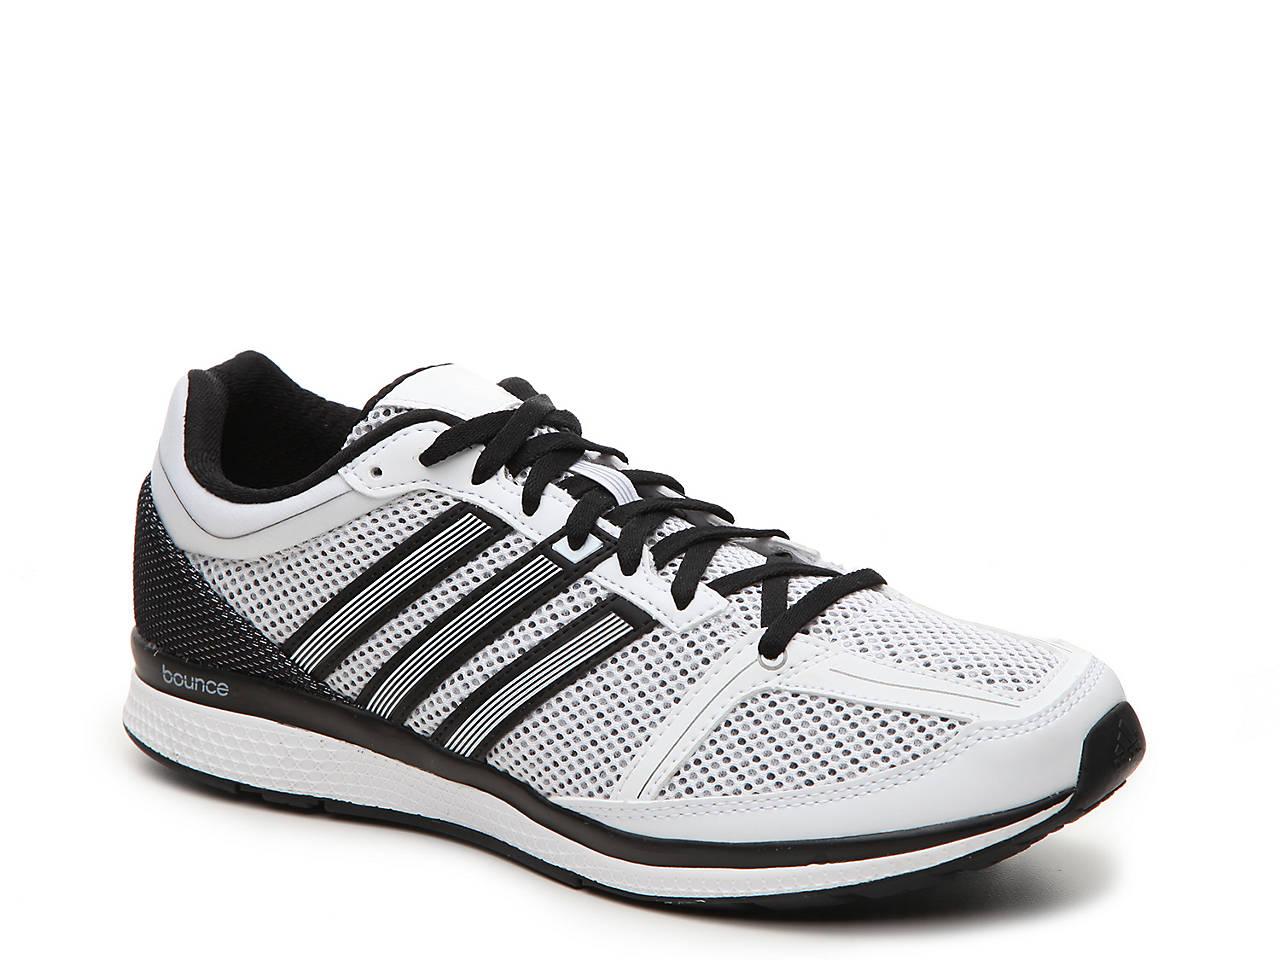 adidas mana rc rimbalzare scarpa da corsa uomini scarpe da uomo dsw